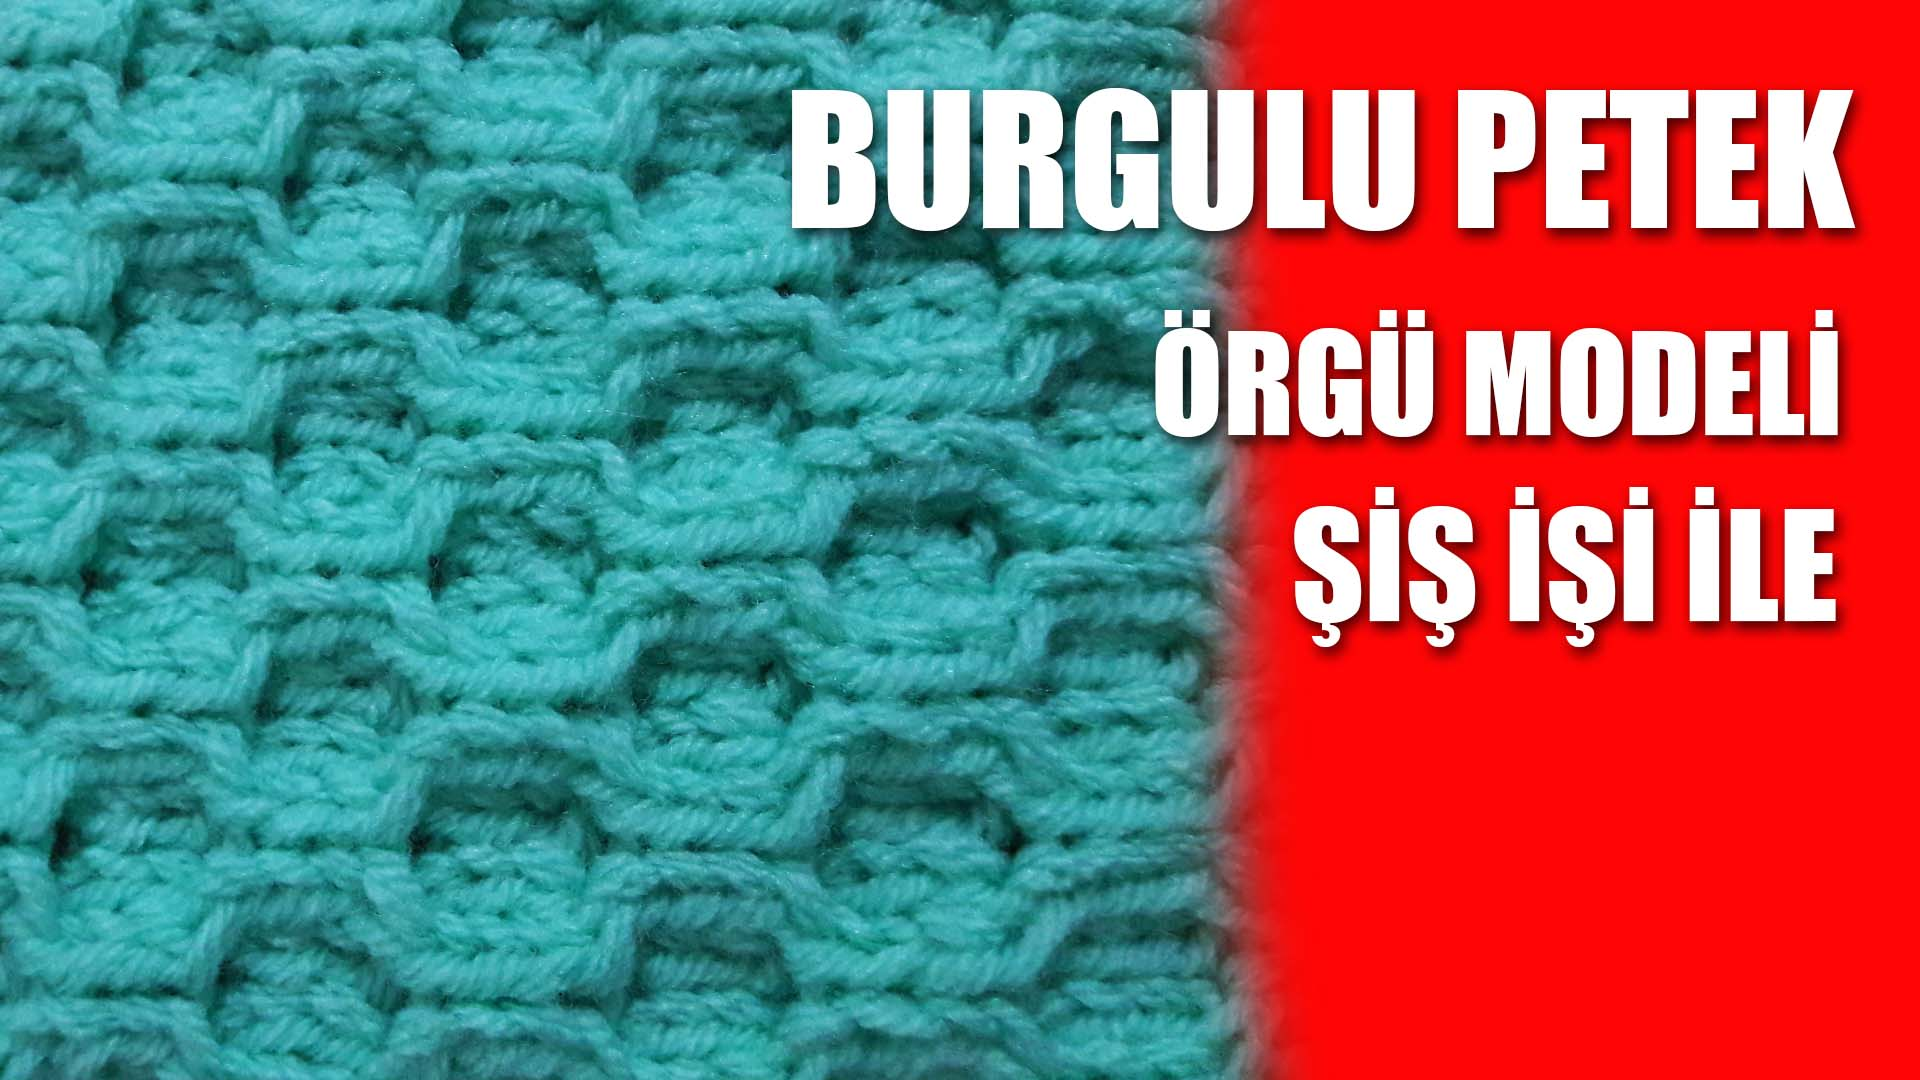 burgulu-petek-orgu-modeli